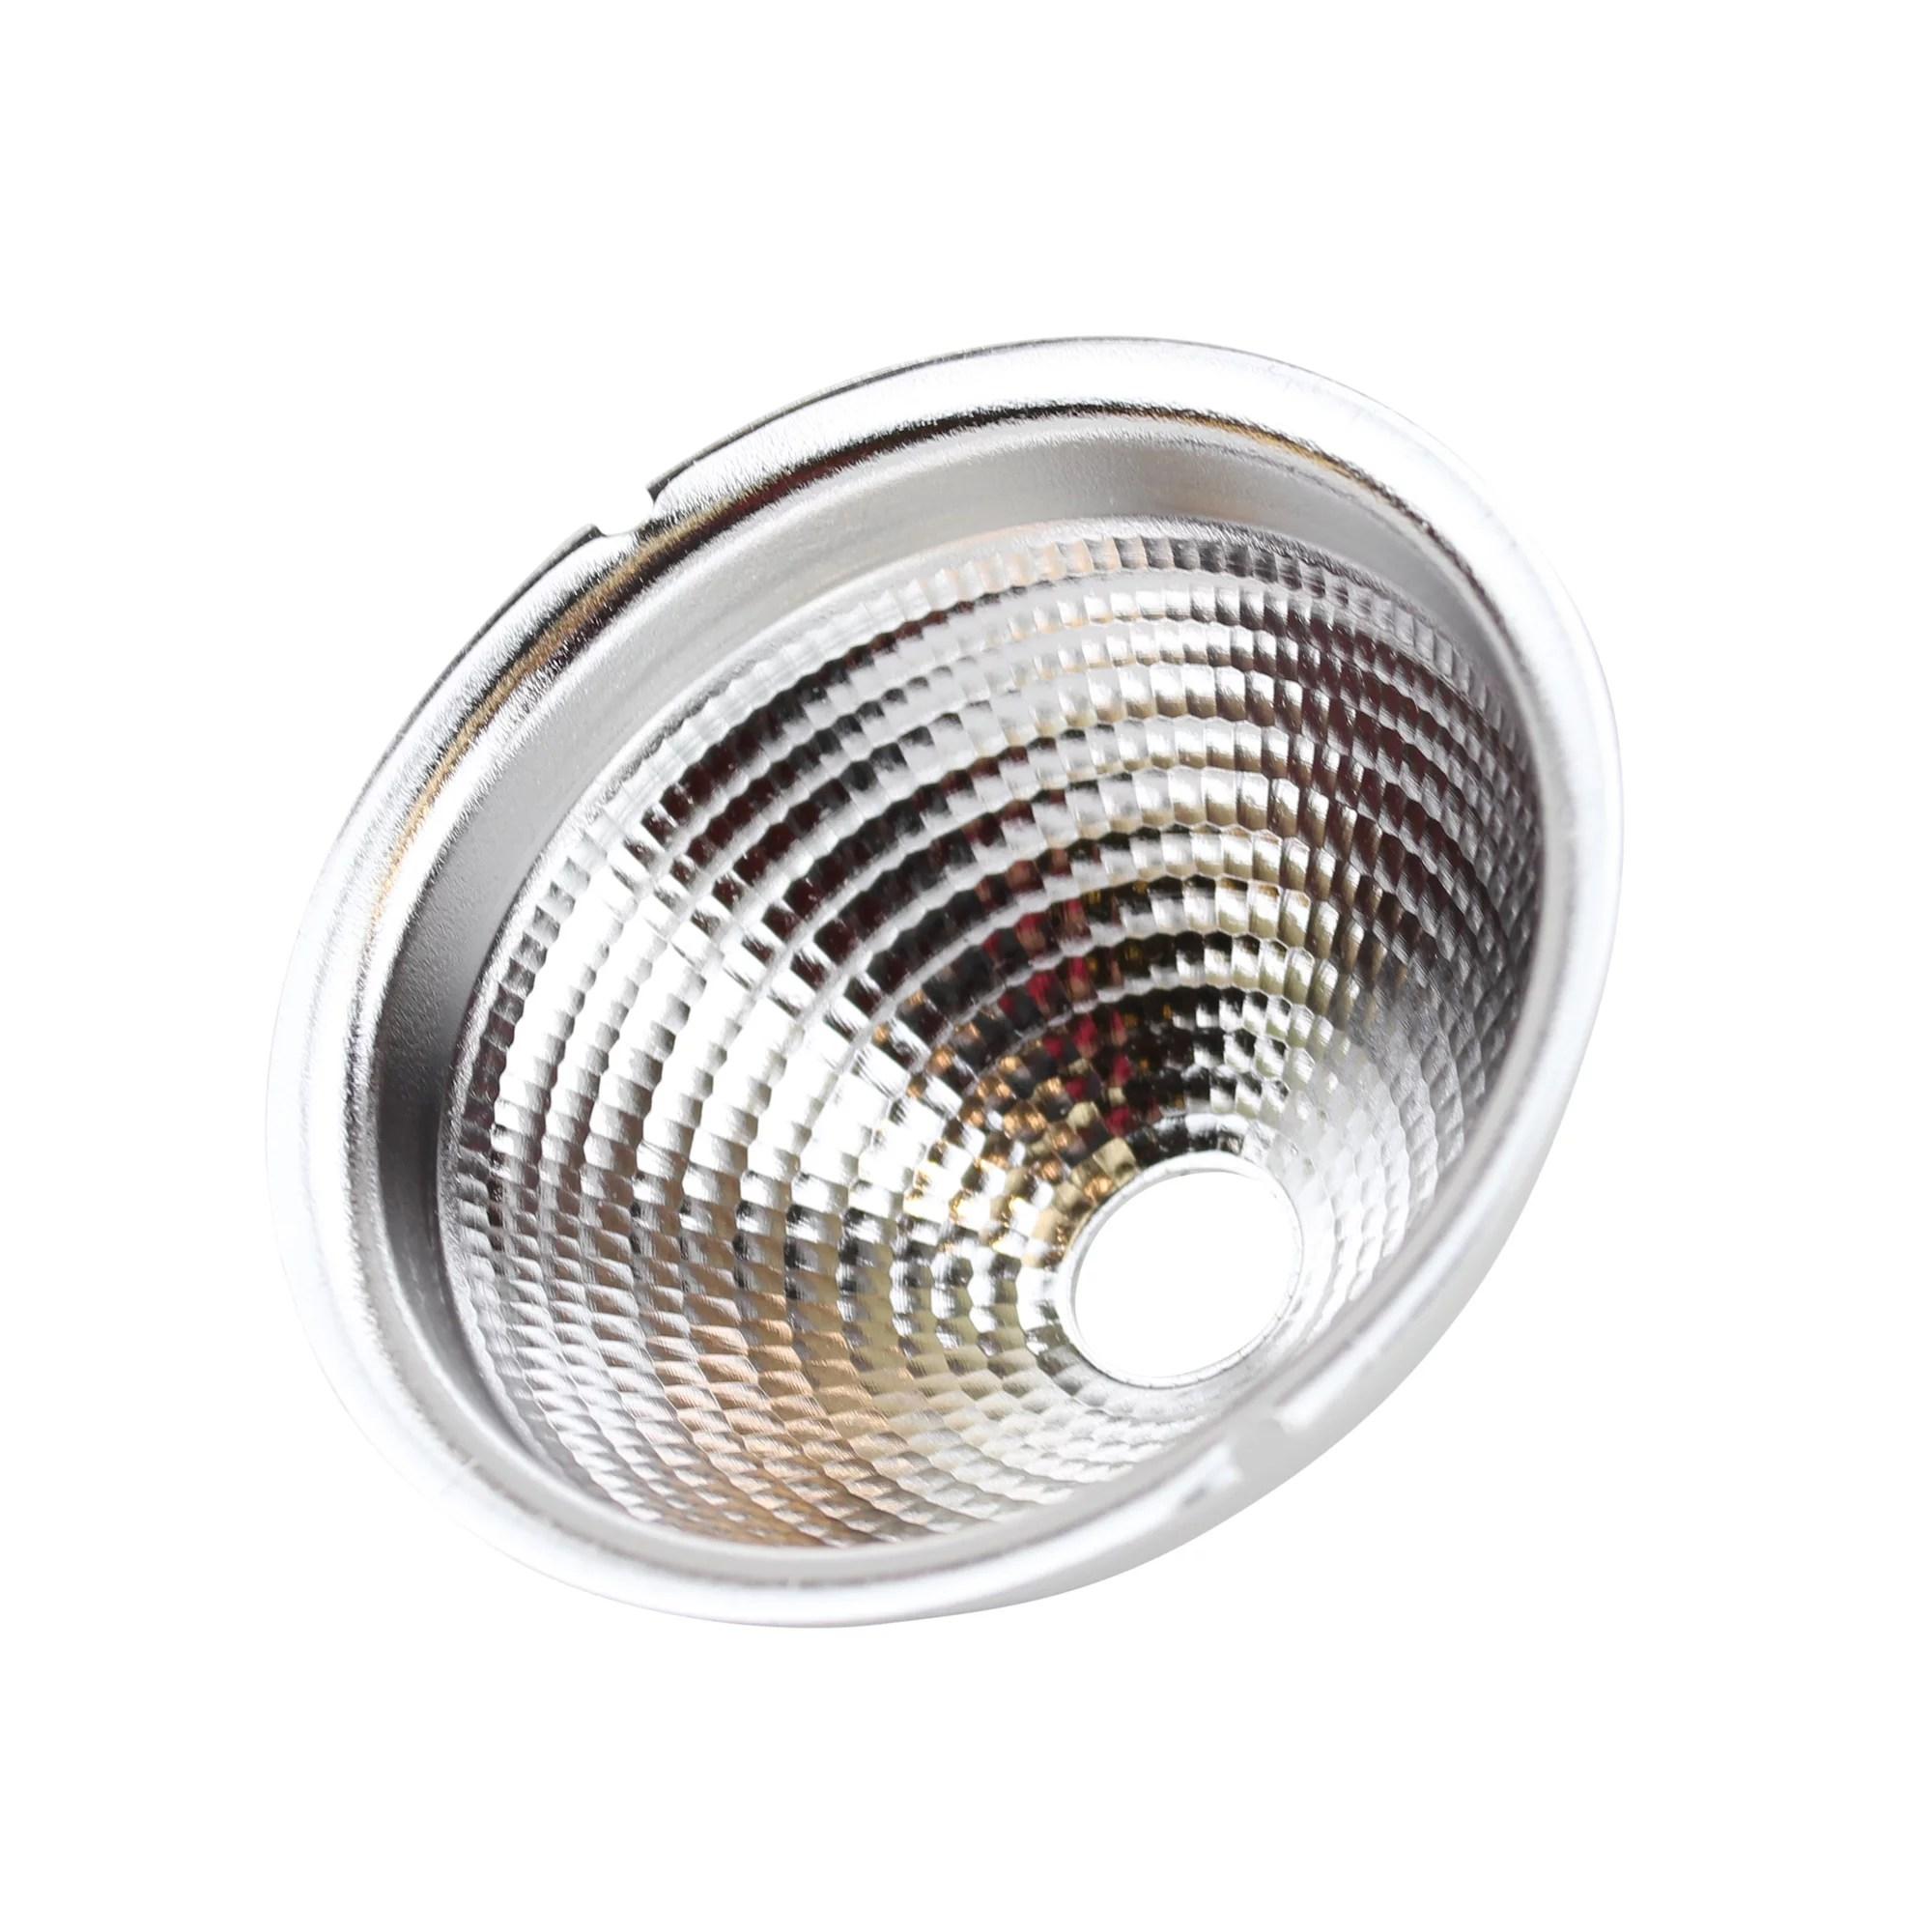 lightolier lytespan 24mht4rnf track lighting system mini hid t4 narrow flood reflector walmart com